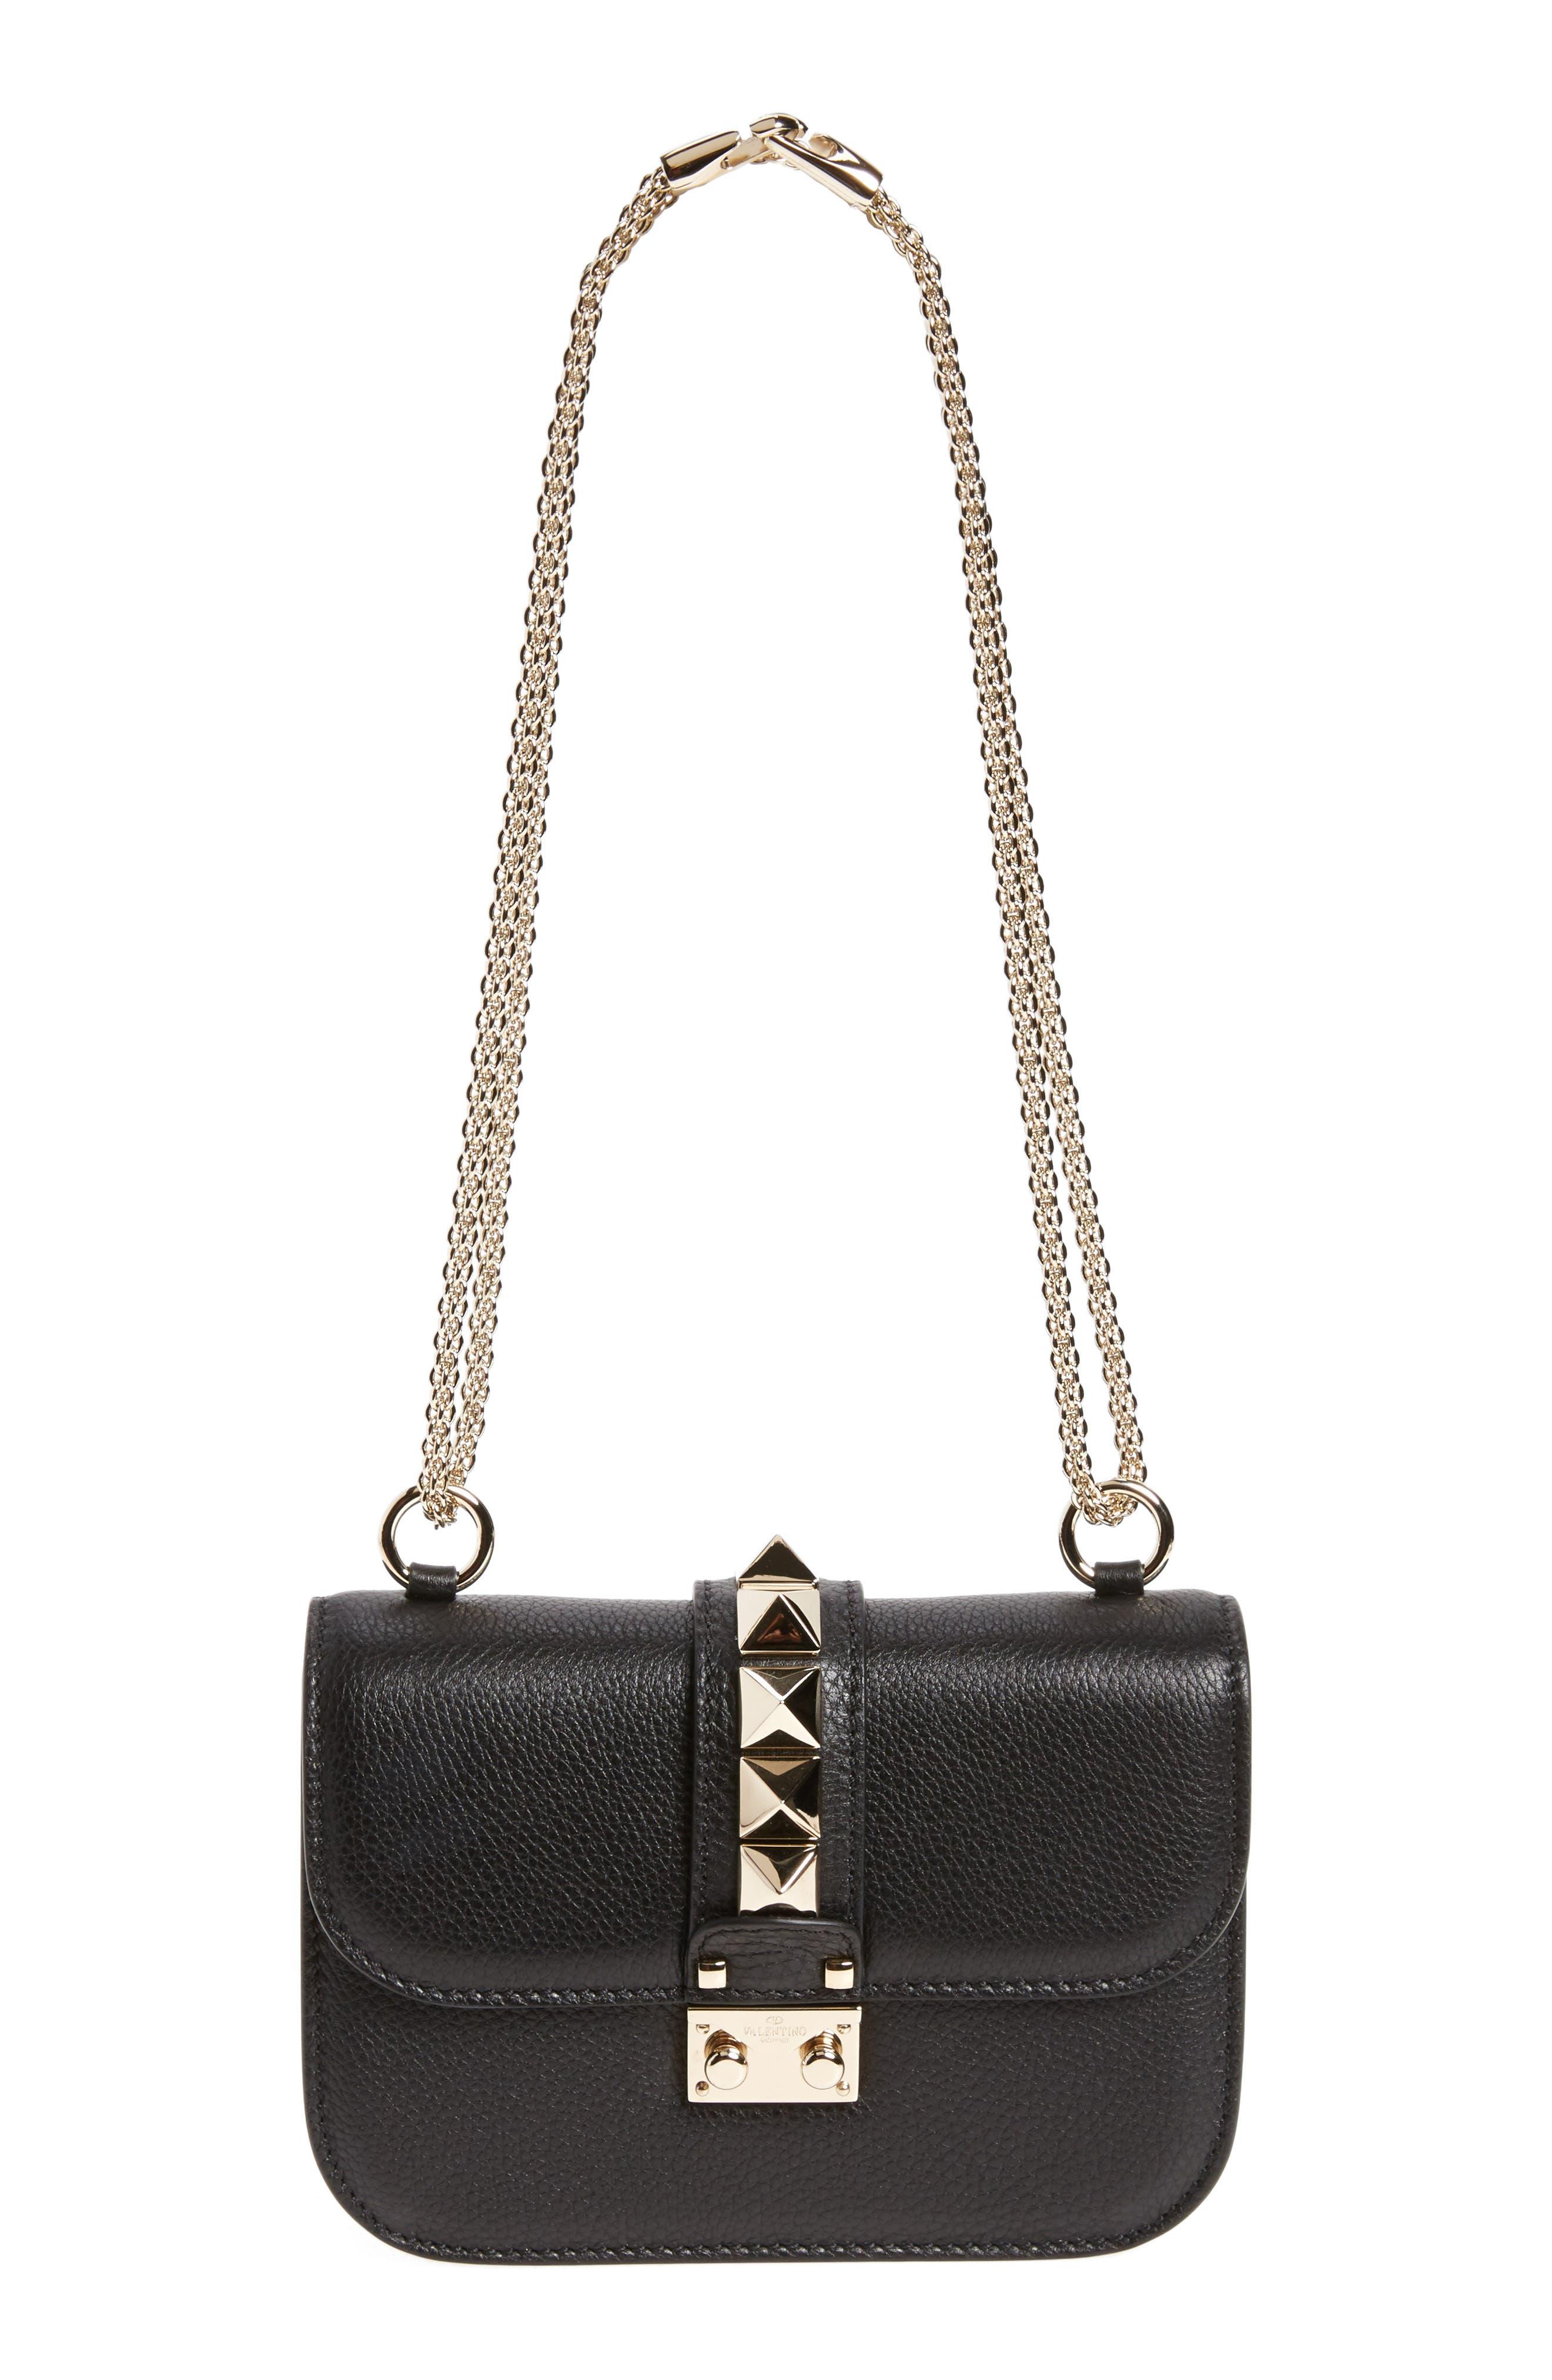 Rockstud - Small Lock Leather Crossbody Bag,                             Main thumbnail 1, color,                             NERO